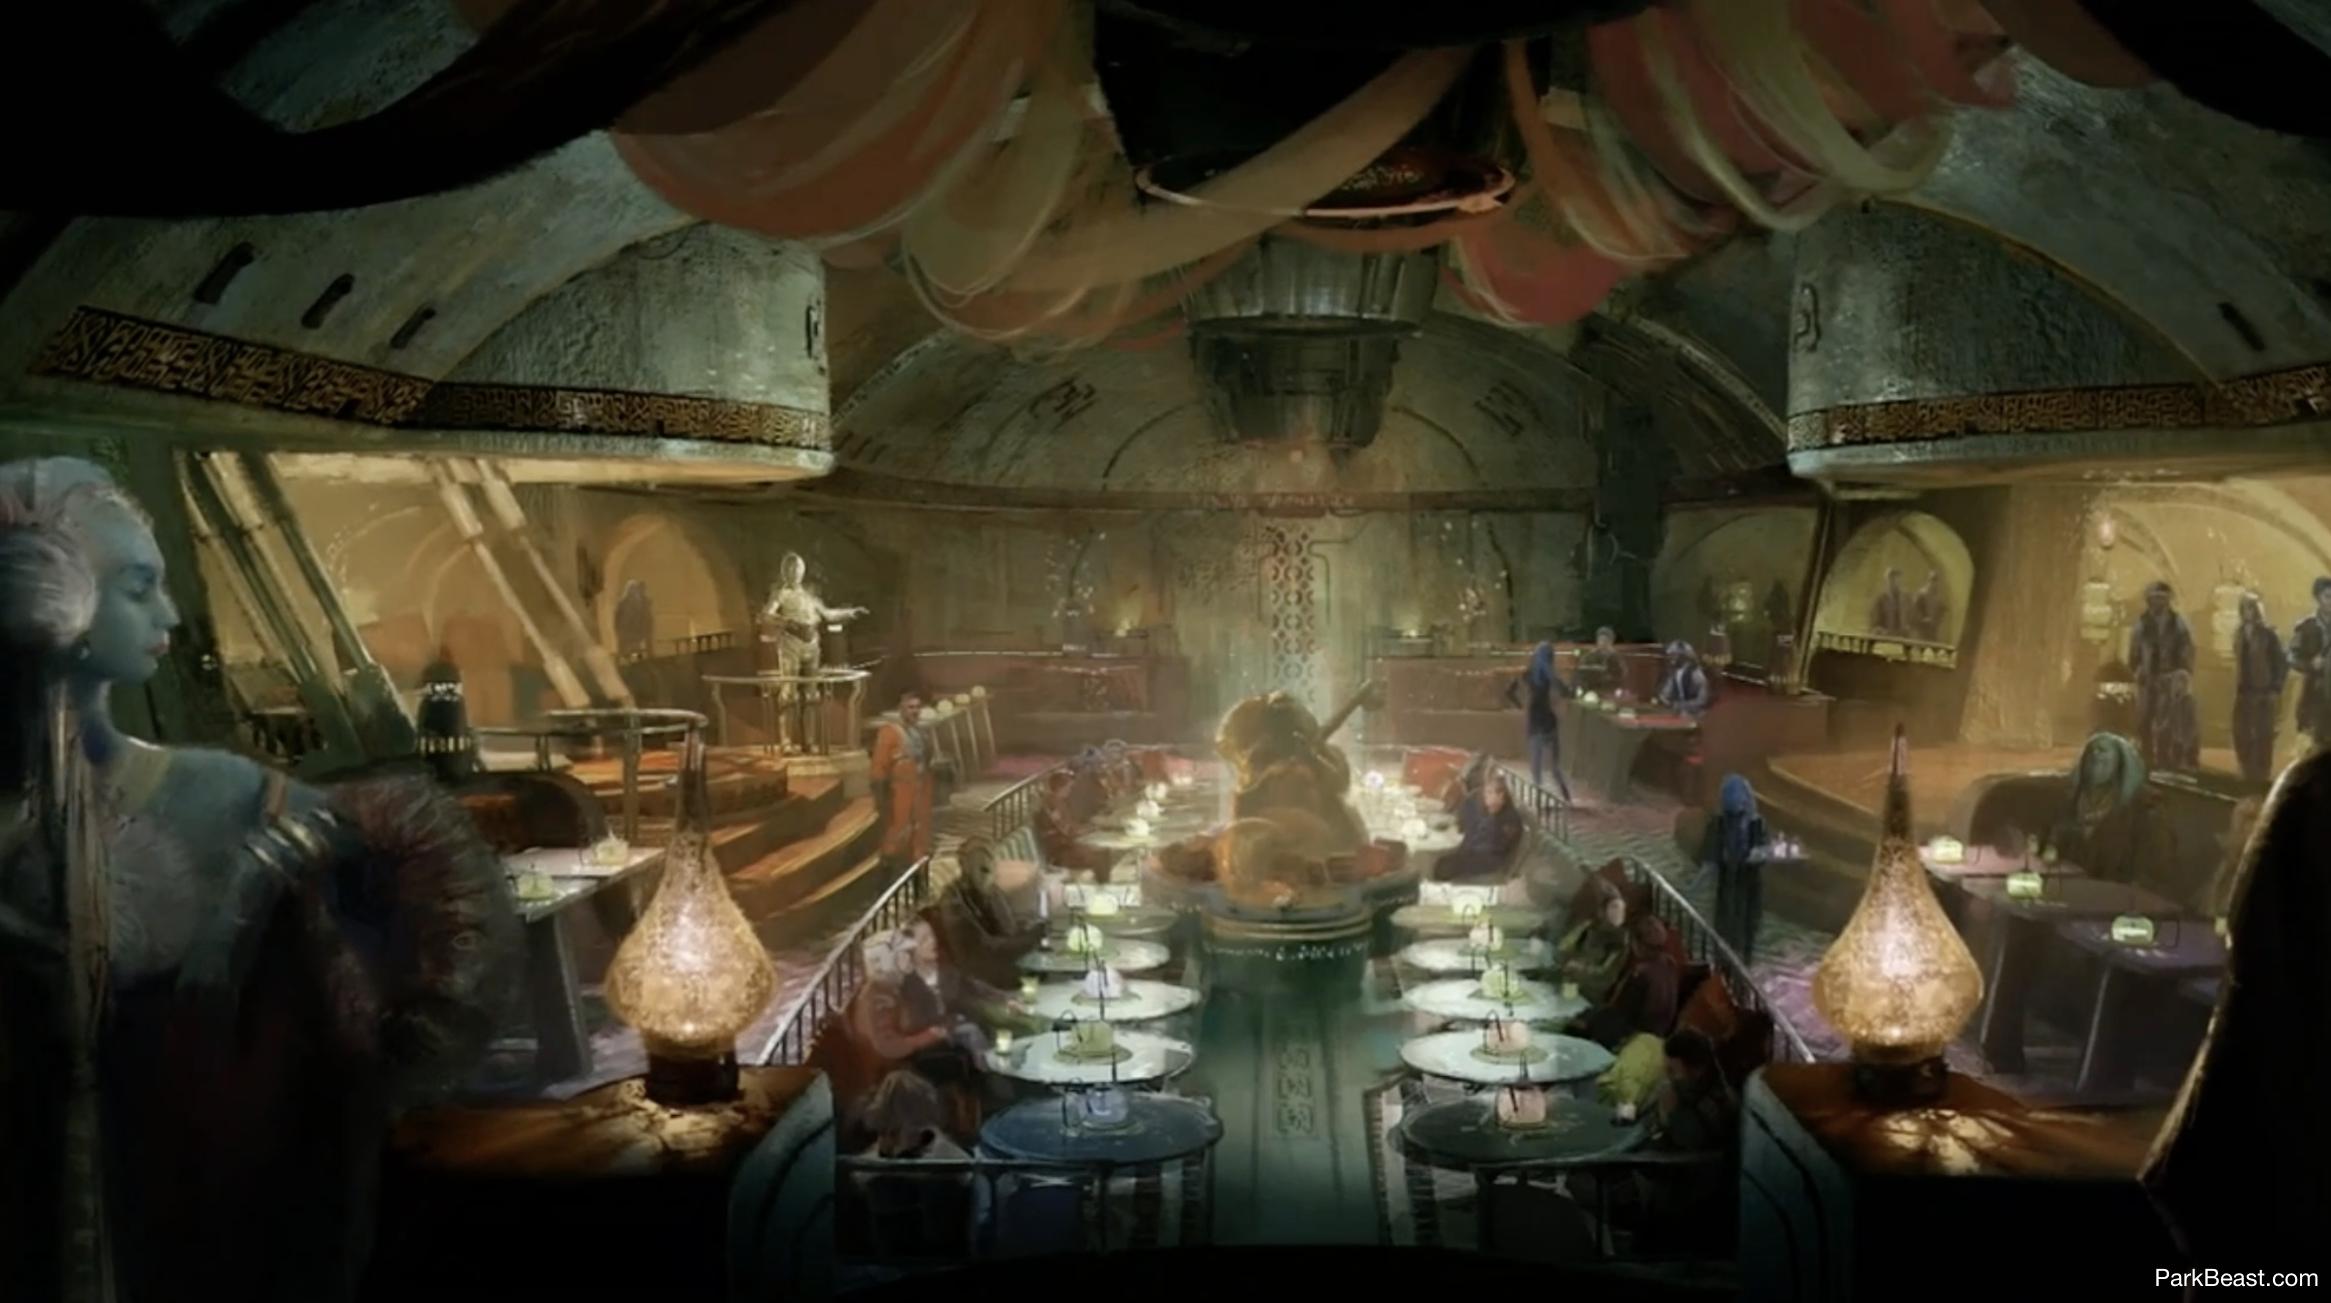 Upscale dinner club